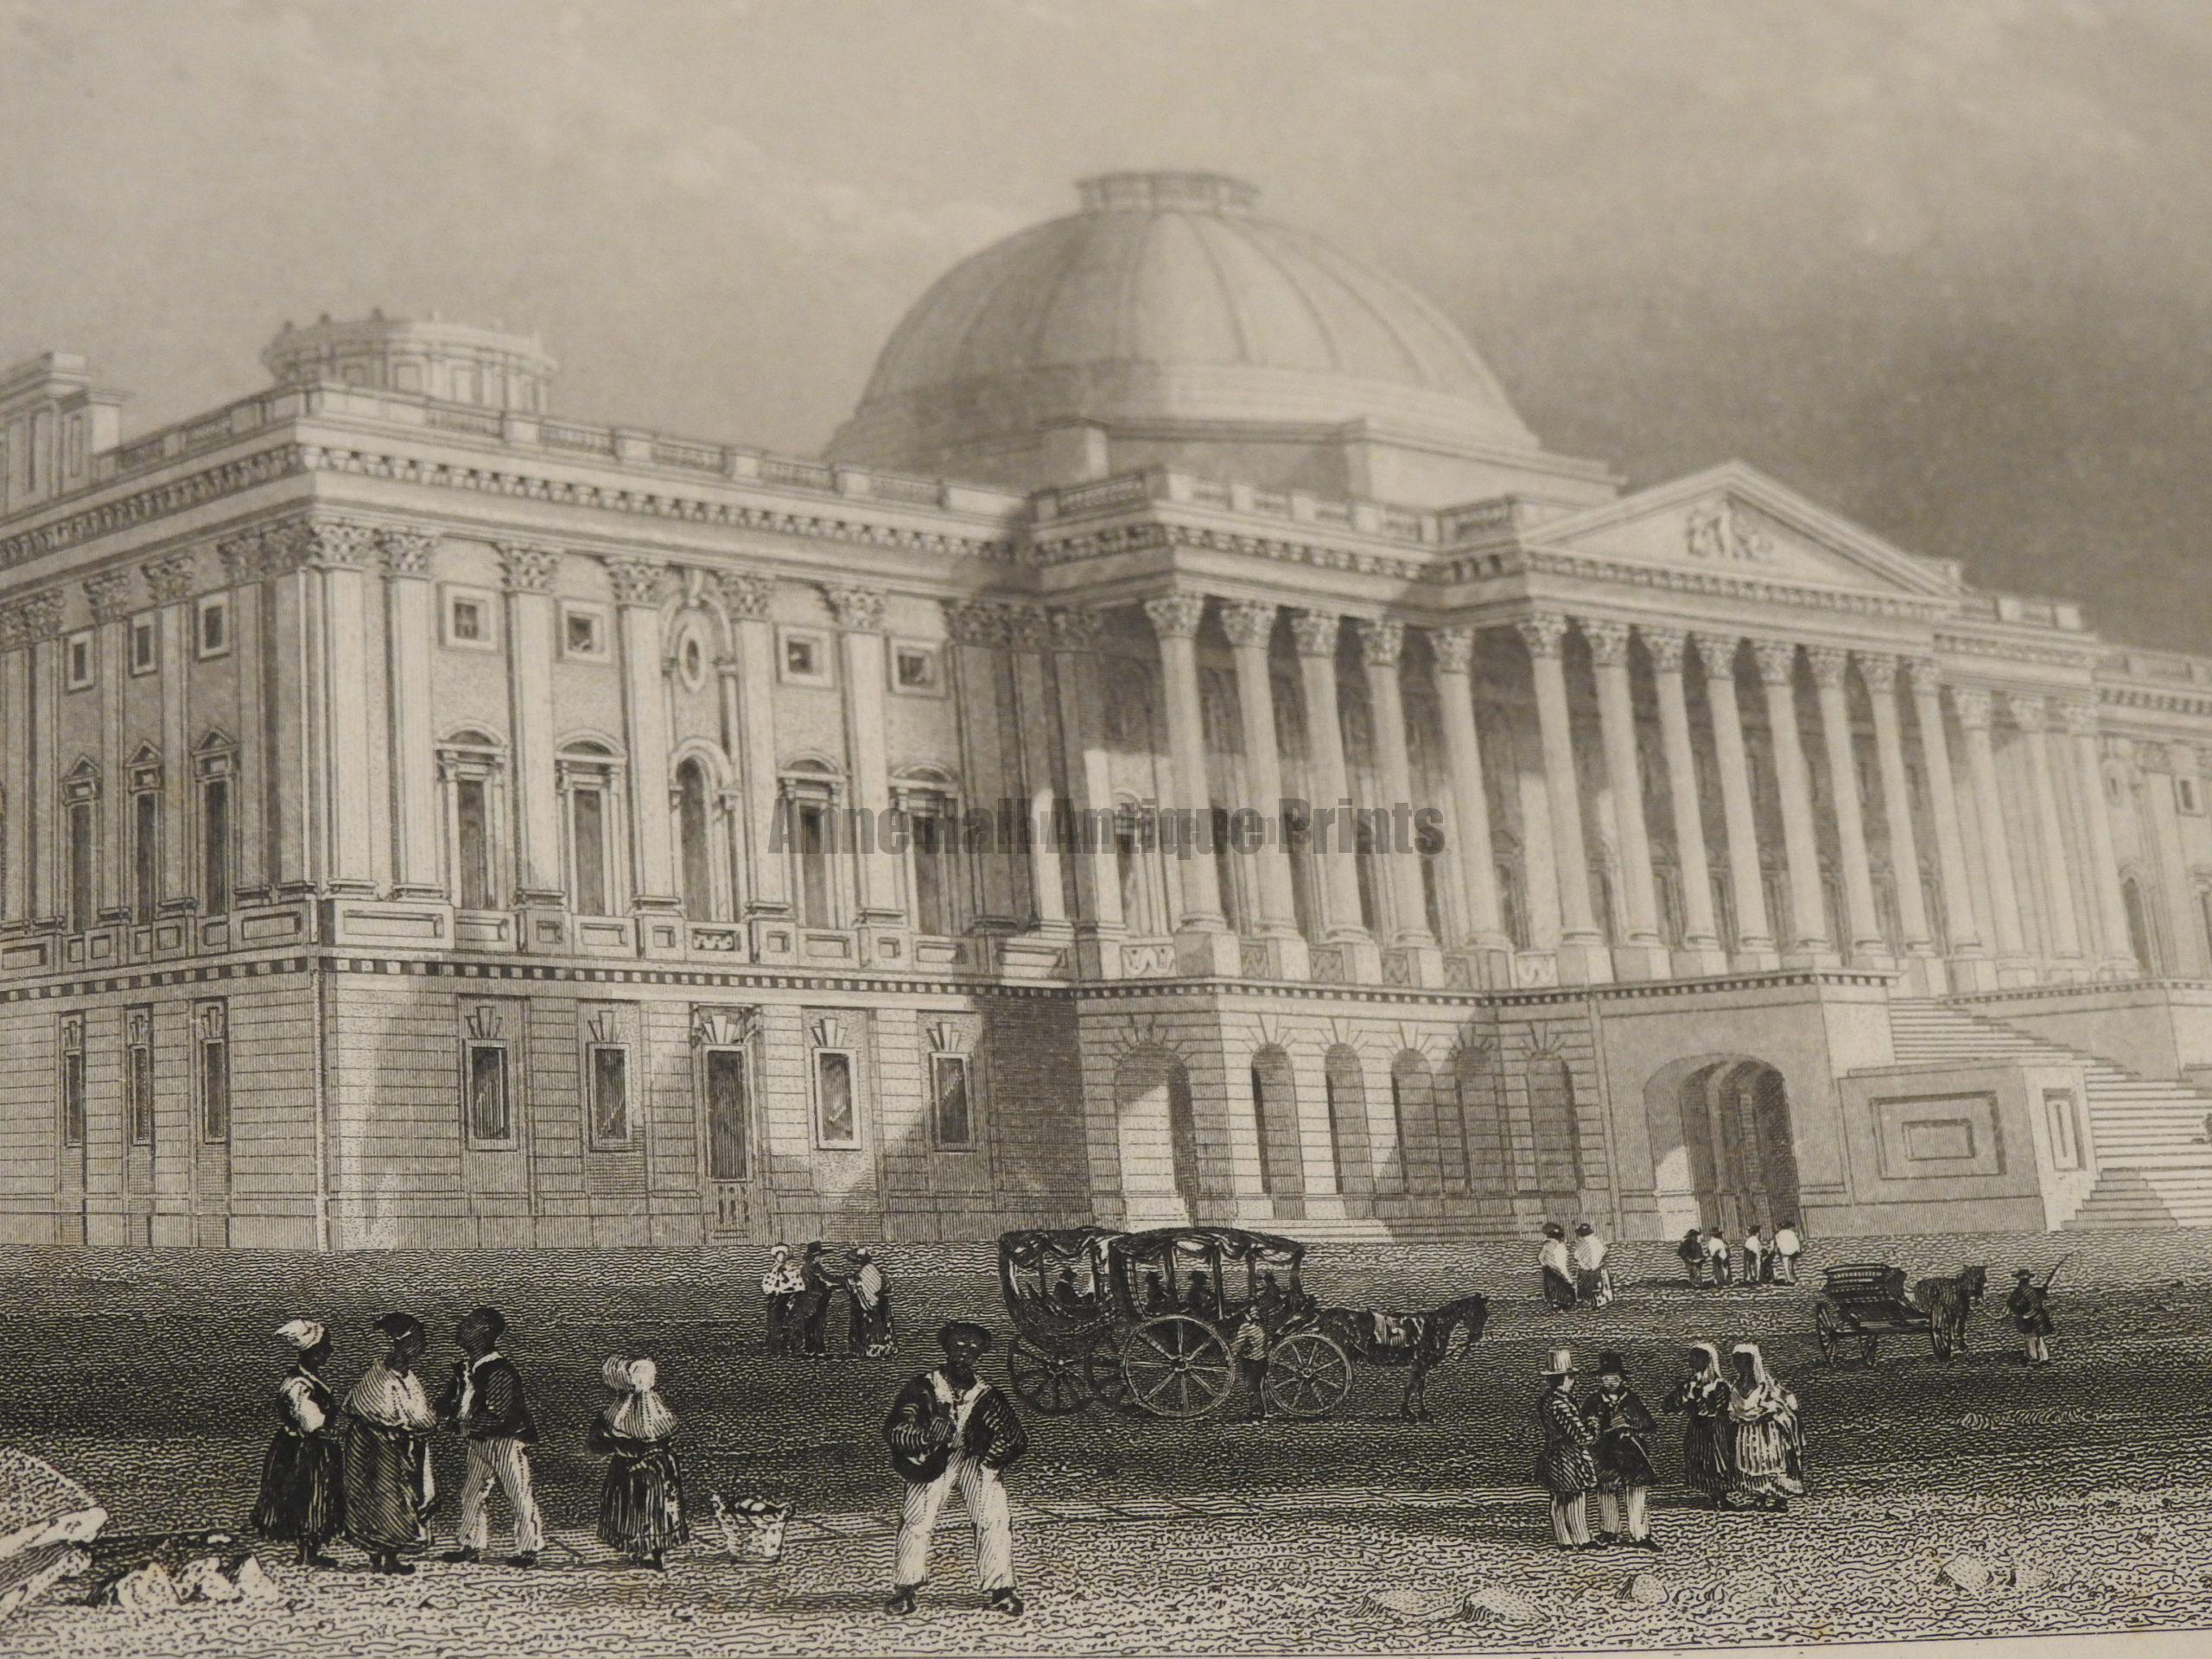 UNITED STATES PATENT OFFICE DEPARTMENT HORSE BUGGY ARCHITECTURE WASHINGTON